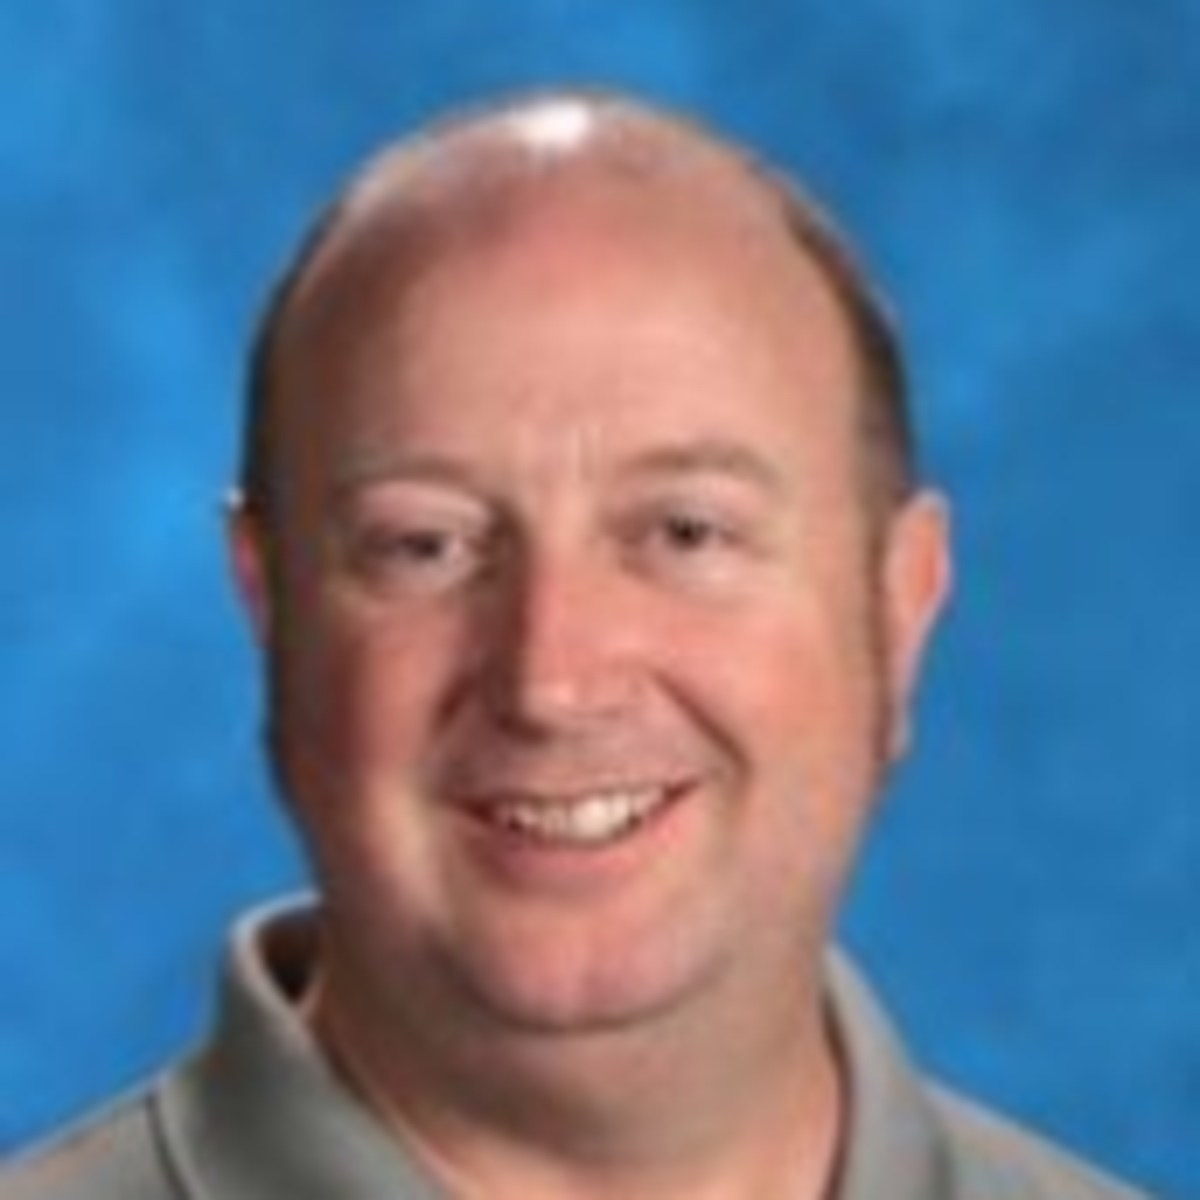 Mr. Ryan Mead